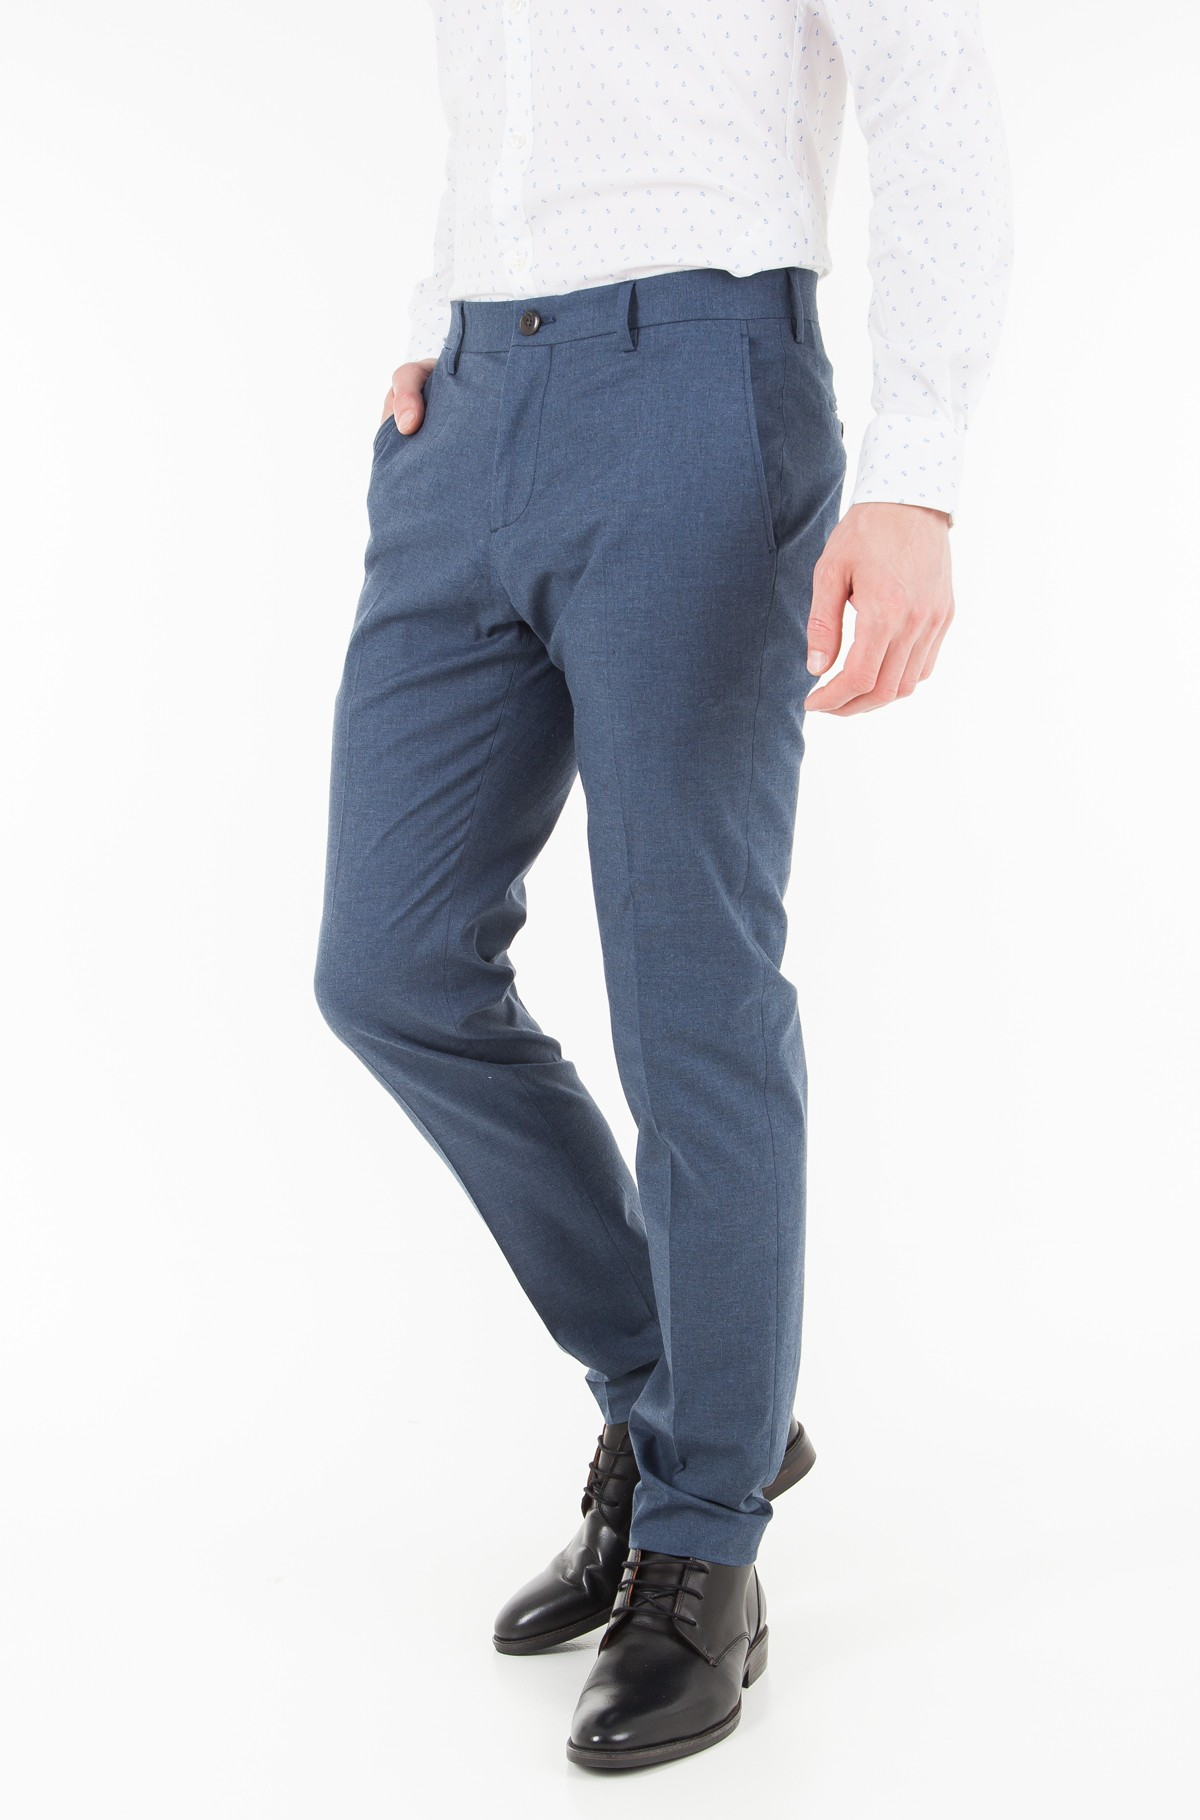 Trousers HMT-S TWSSLD18302-full-1